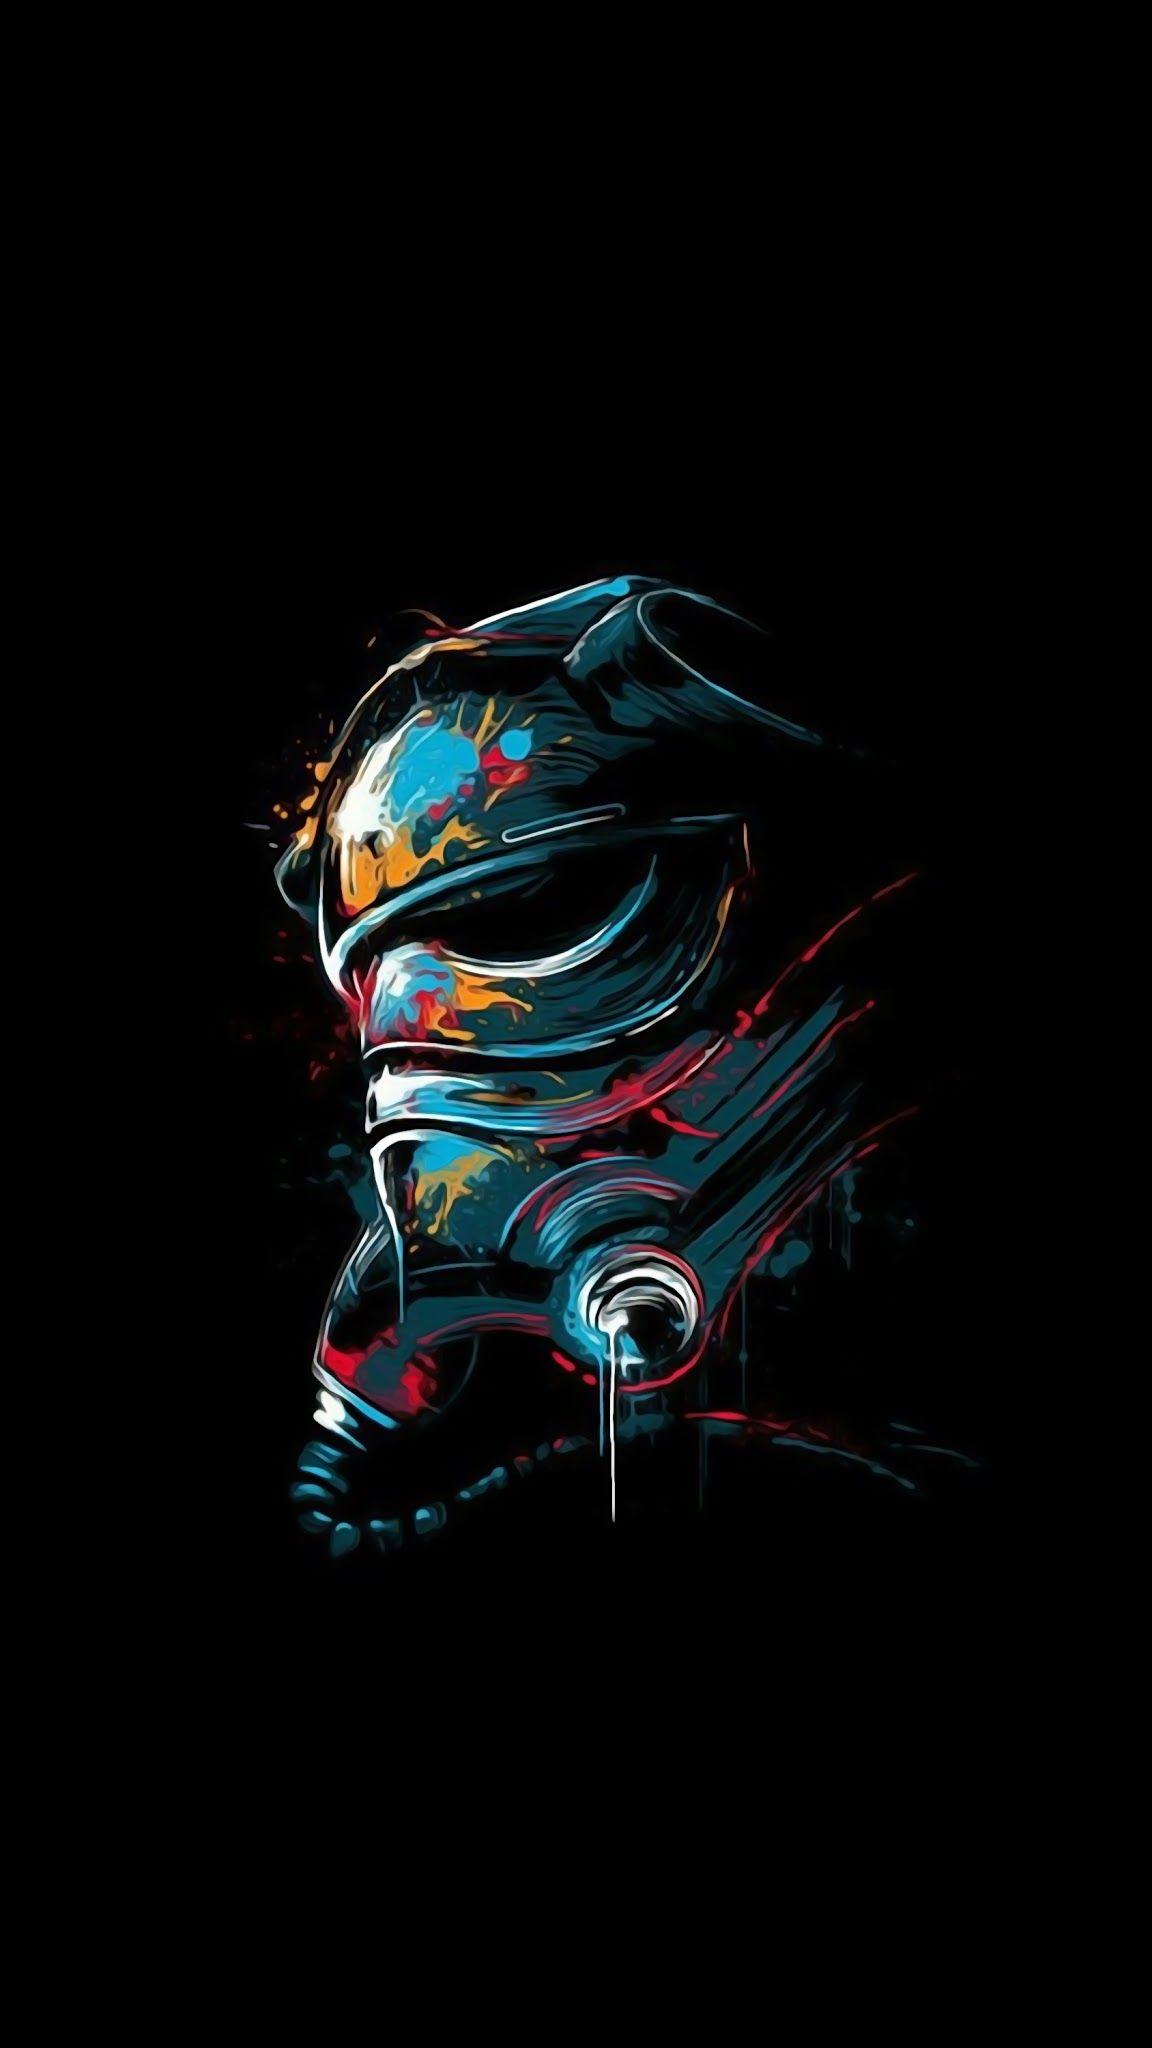 Starwars Star Wars Fan Art Fondos De Pantalla 1080p Fondos De Pantalla De Iphone